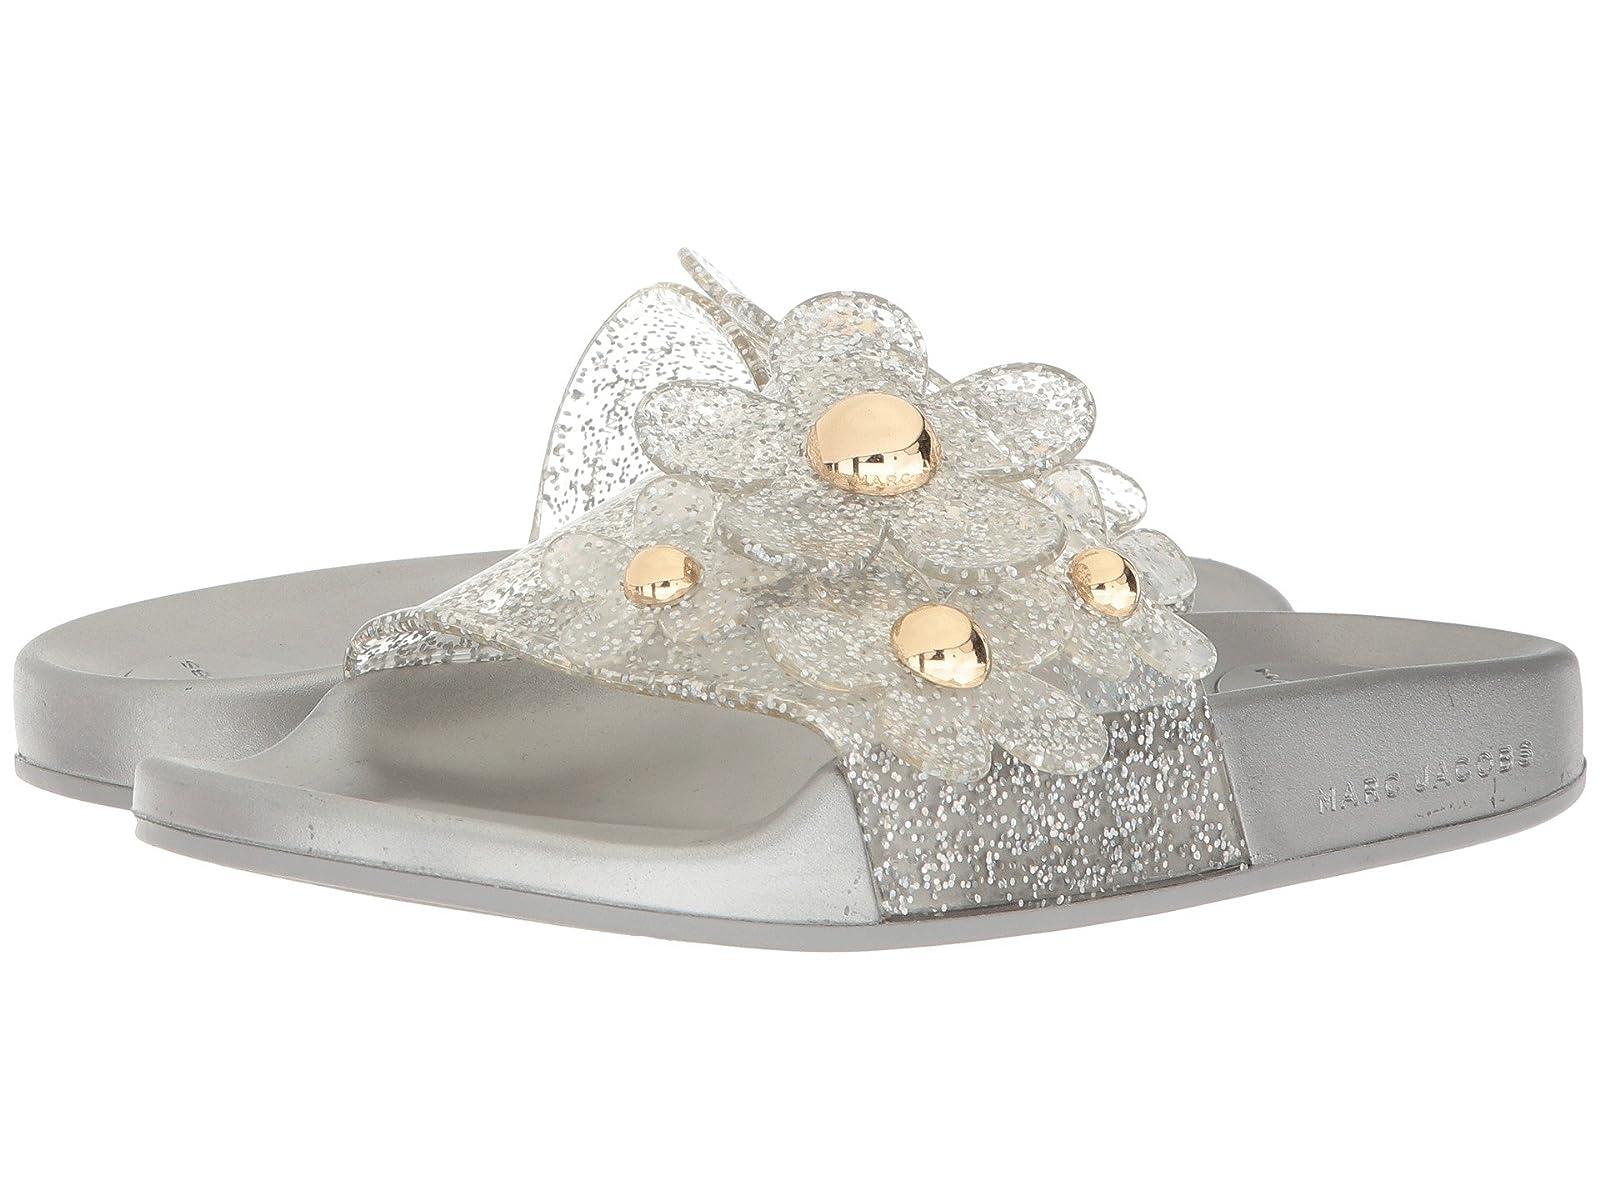 Marc Jacobs Daisy Aqua SlideCheap and distinctive eye-catching shoes